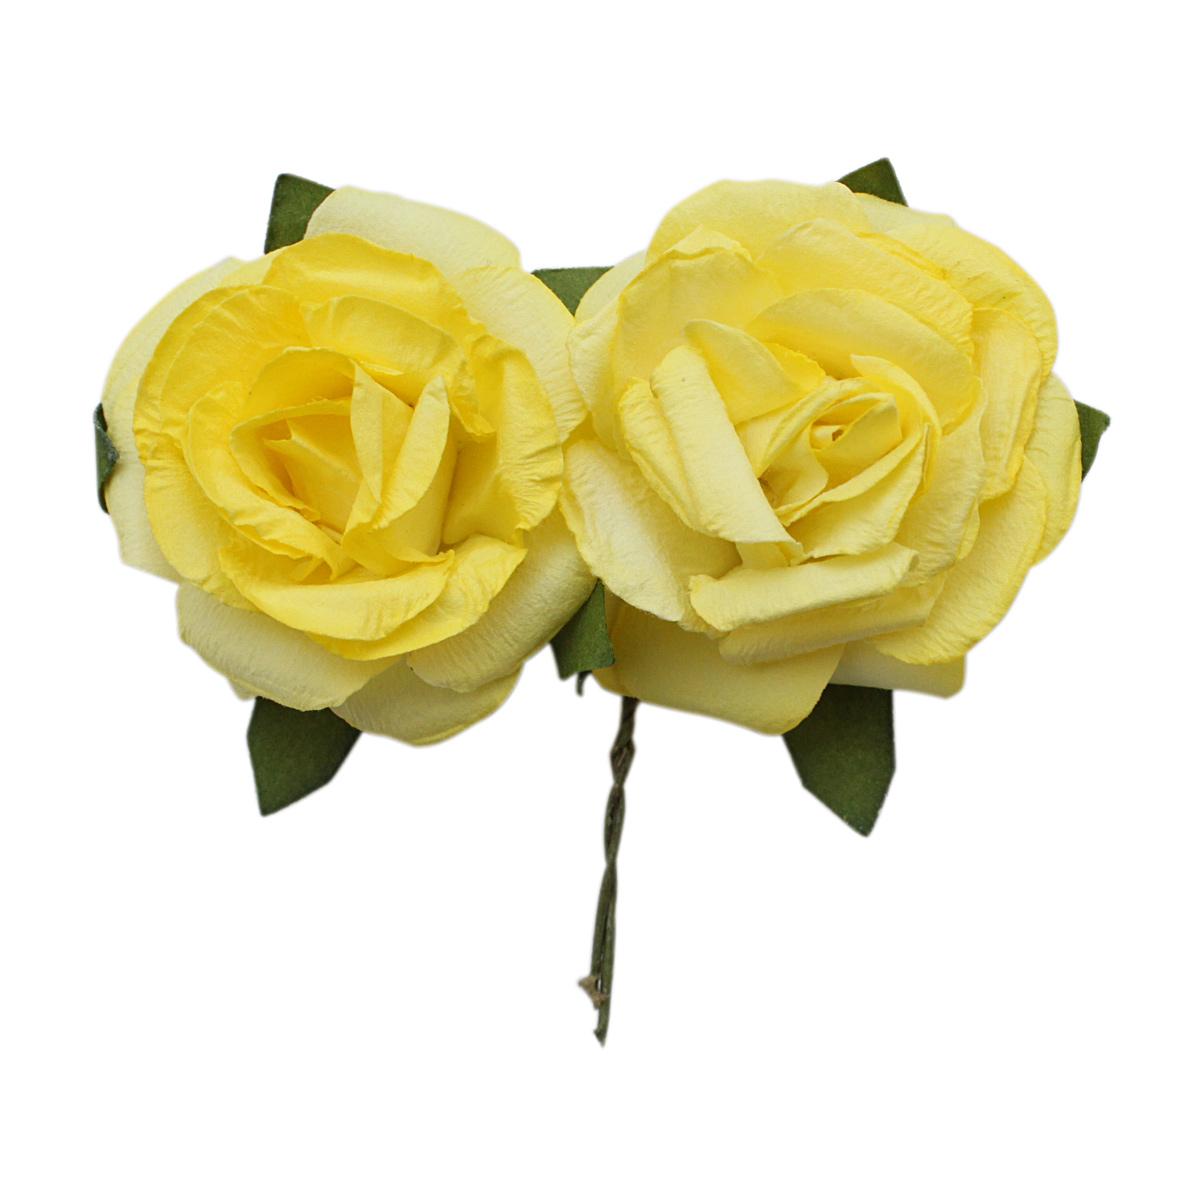 MH3-2324 Набор декоративных цветов D=4,3*2см, 6шт, Астра (E13 желтый) фото